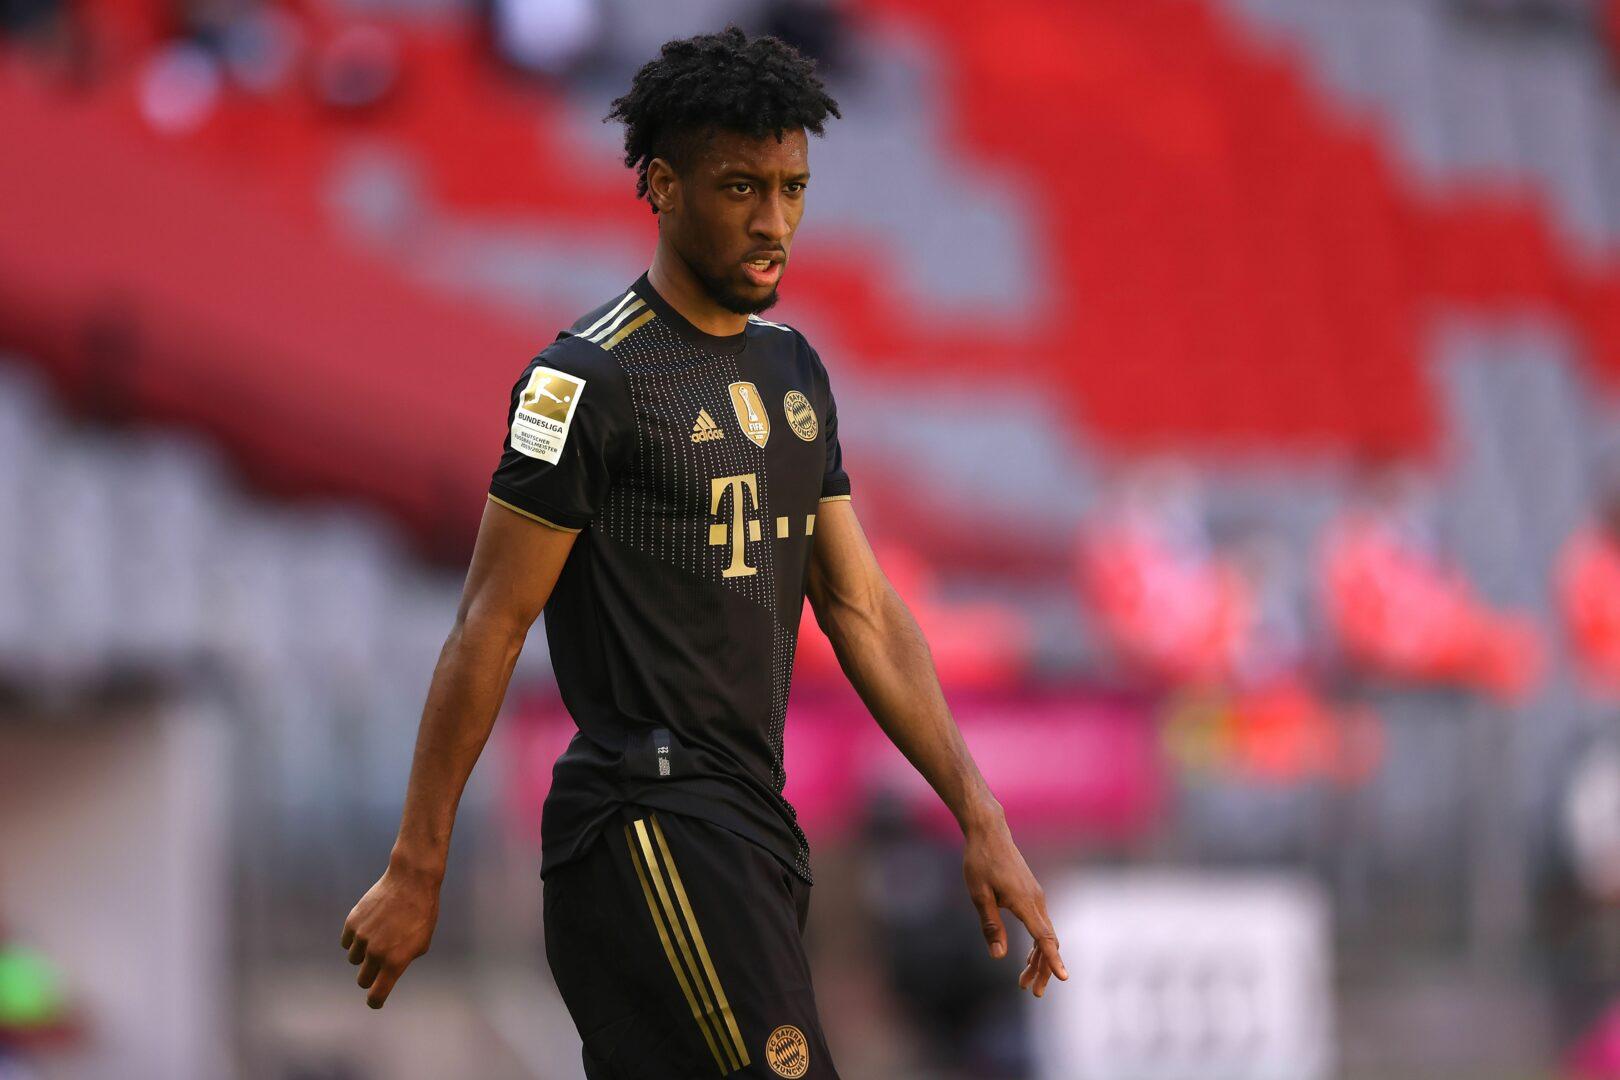 Kingsley Coman im Trikot des FC Bayern München